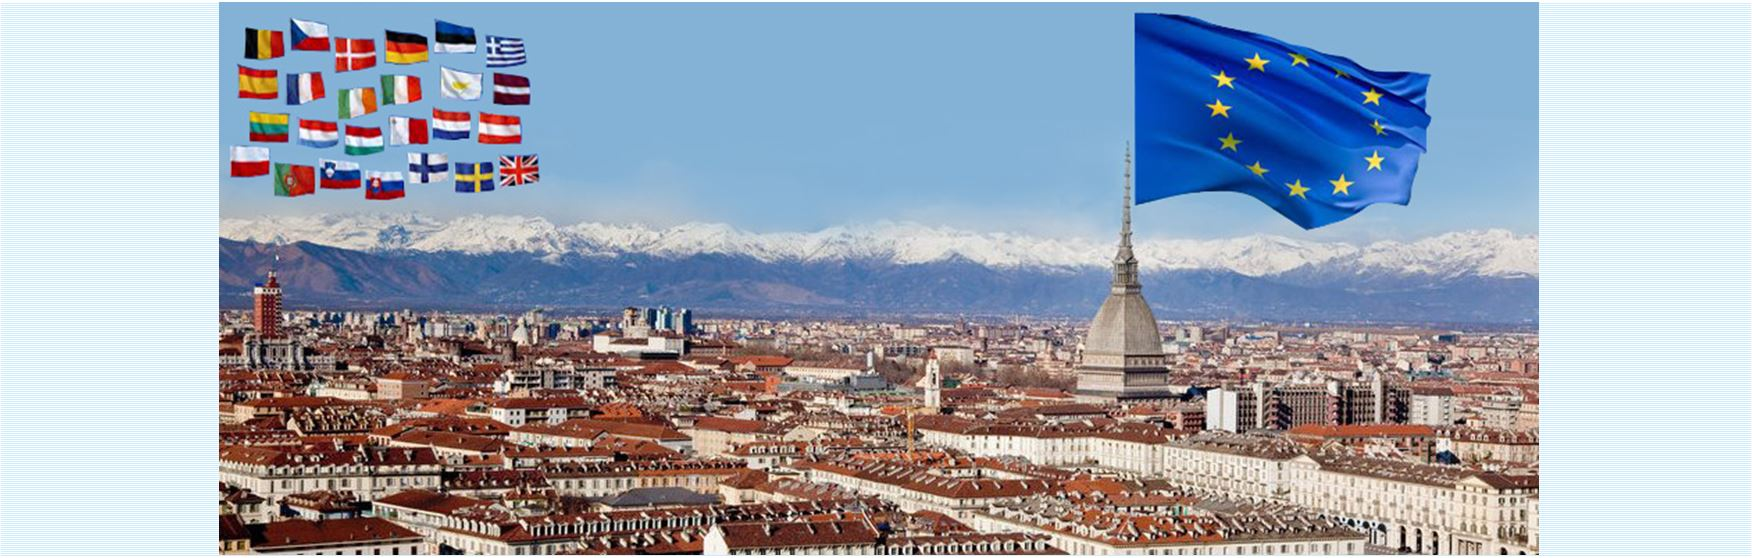 Torino (Piemonte, Italia)